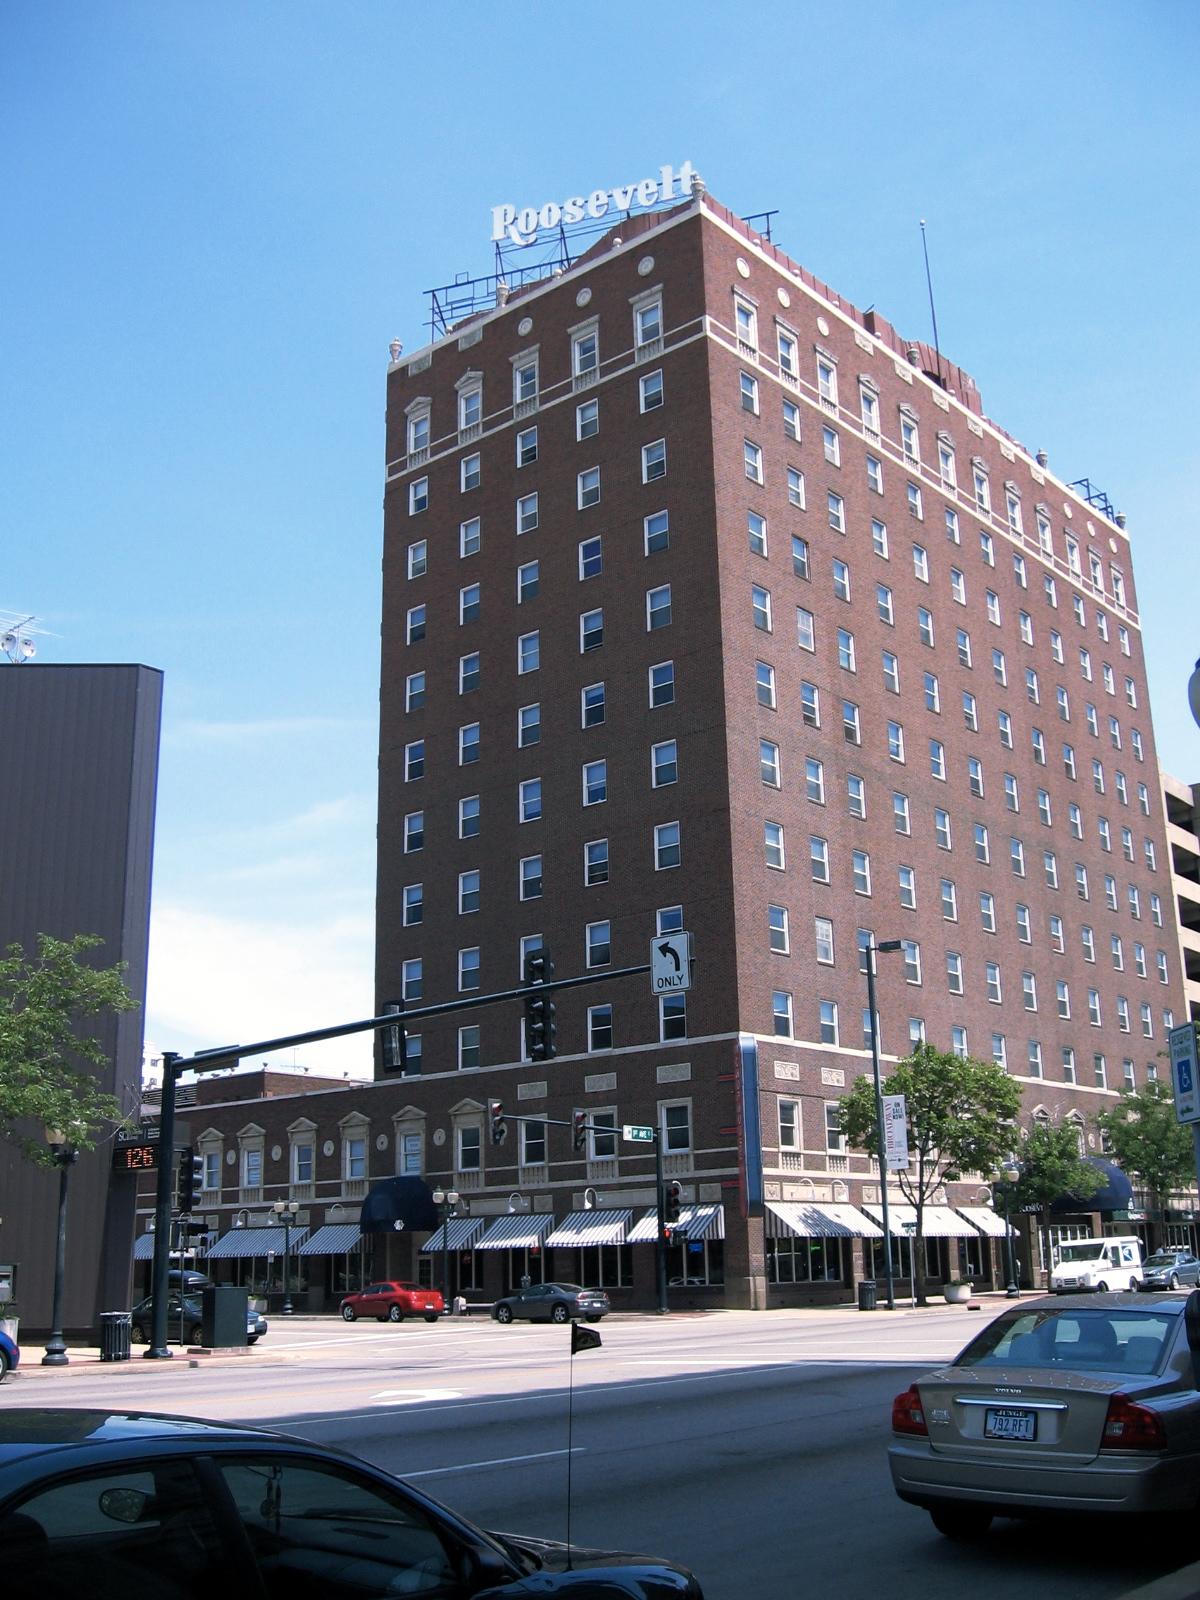 Hotel Roosevelt Cedar Rapids Iowa Wikipedia